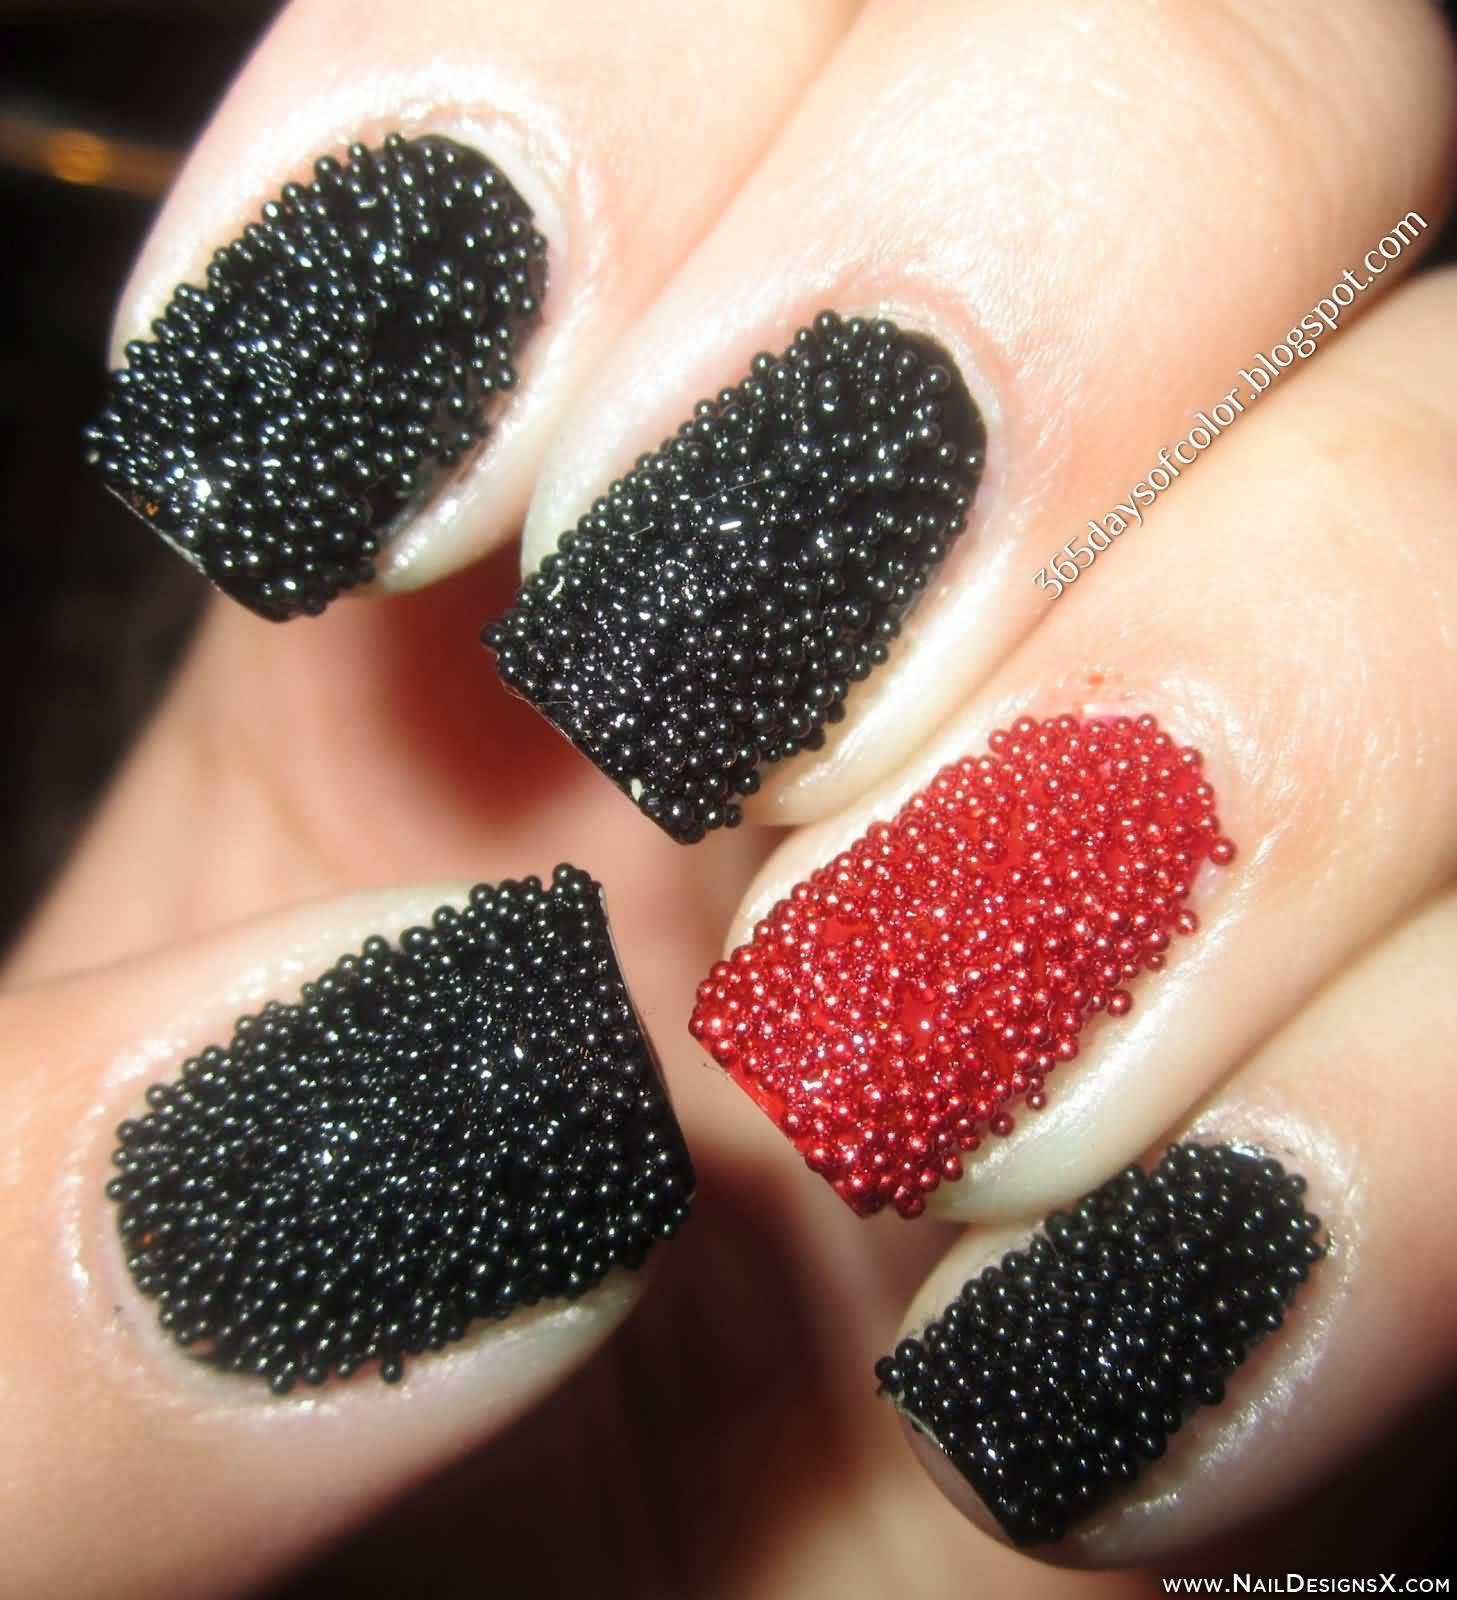 Black And Red Caviar Nail Art Design